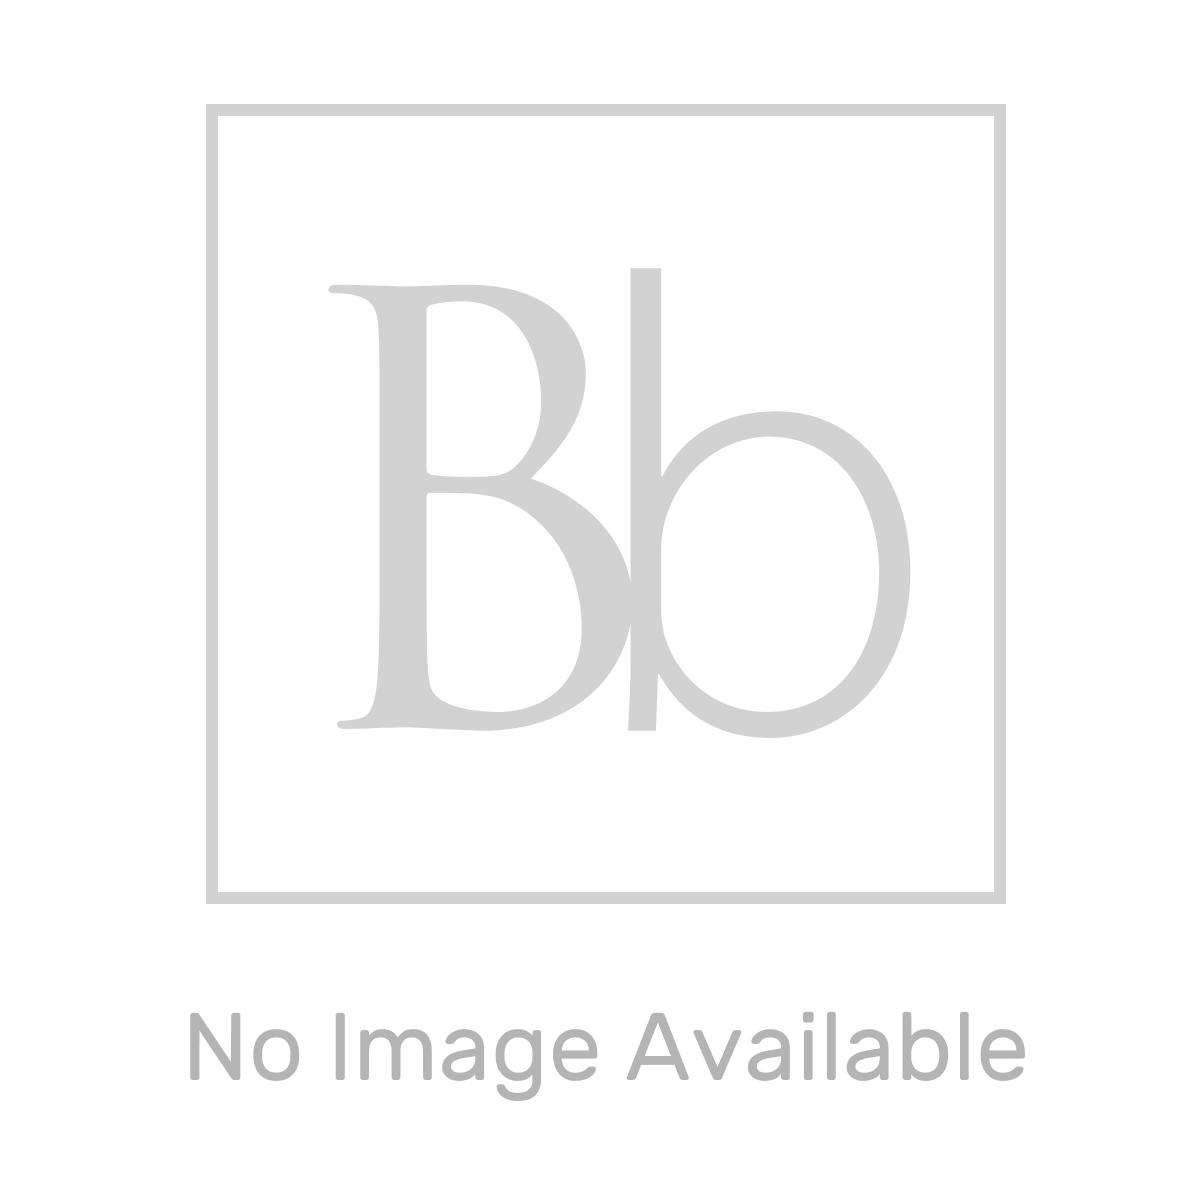 Aquadart Black Slate Shower Tray 1500 x 700 Lifestyle